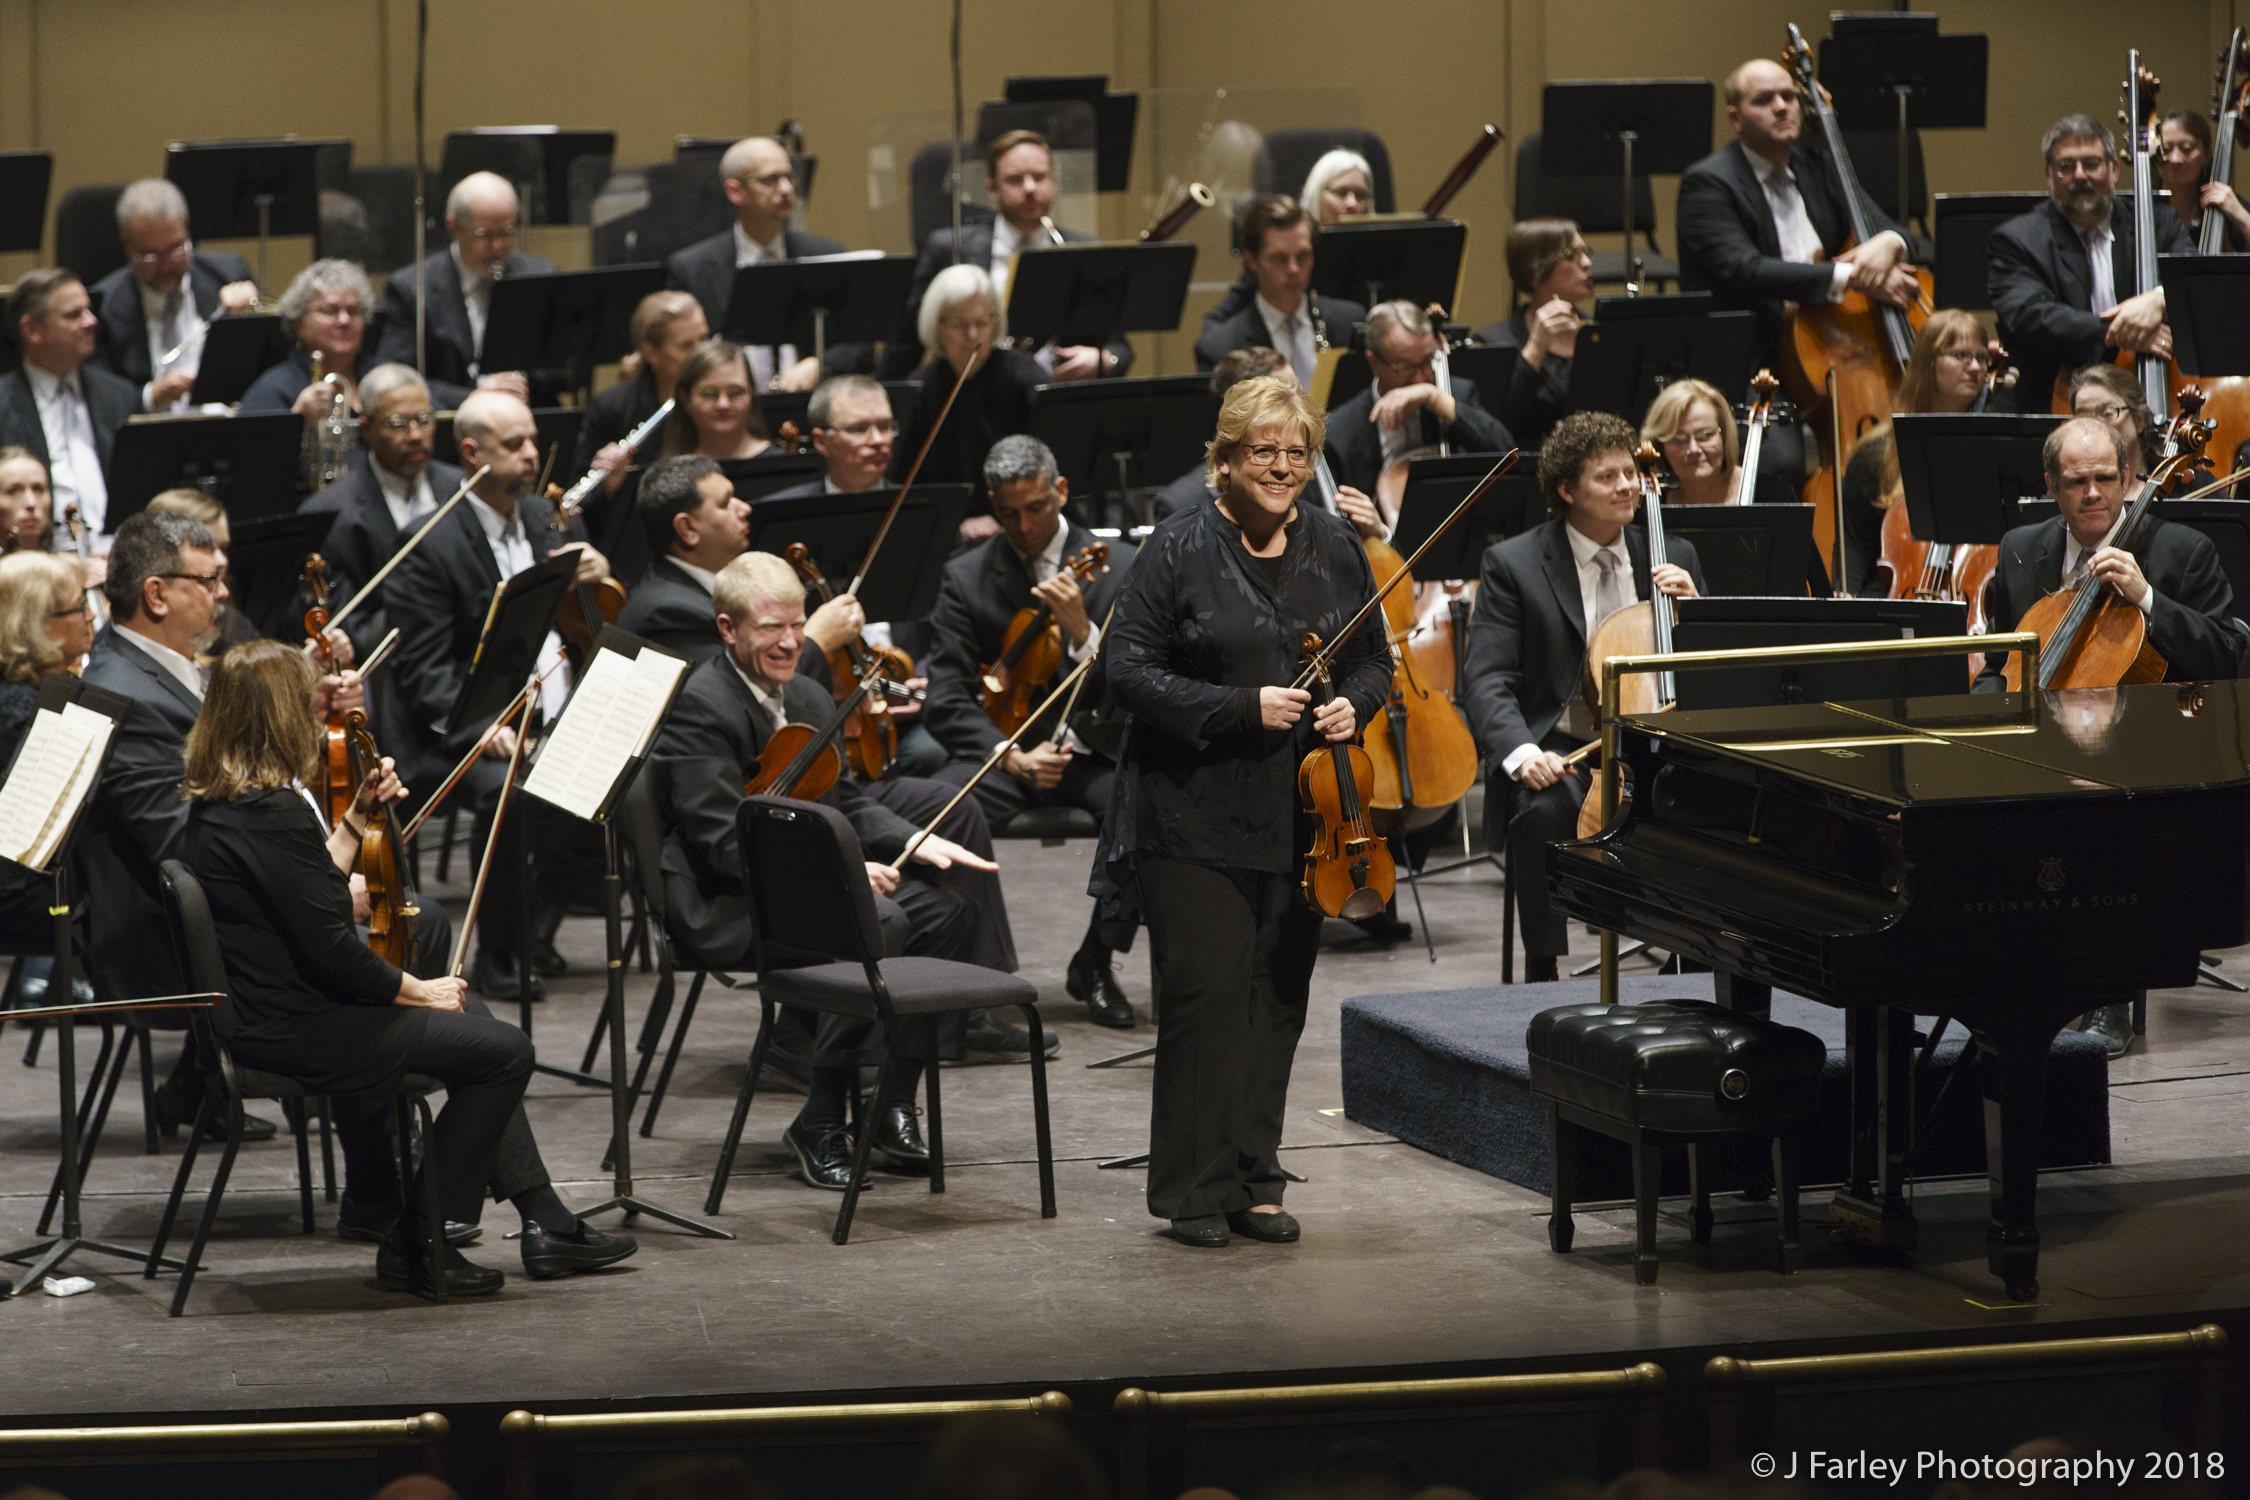 Concertmaster Corine Brouwer and the Winston-Salem Symphony